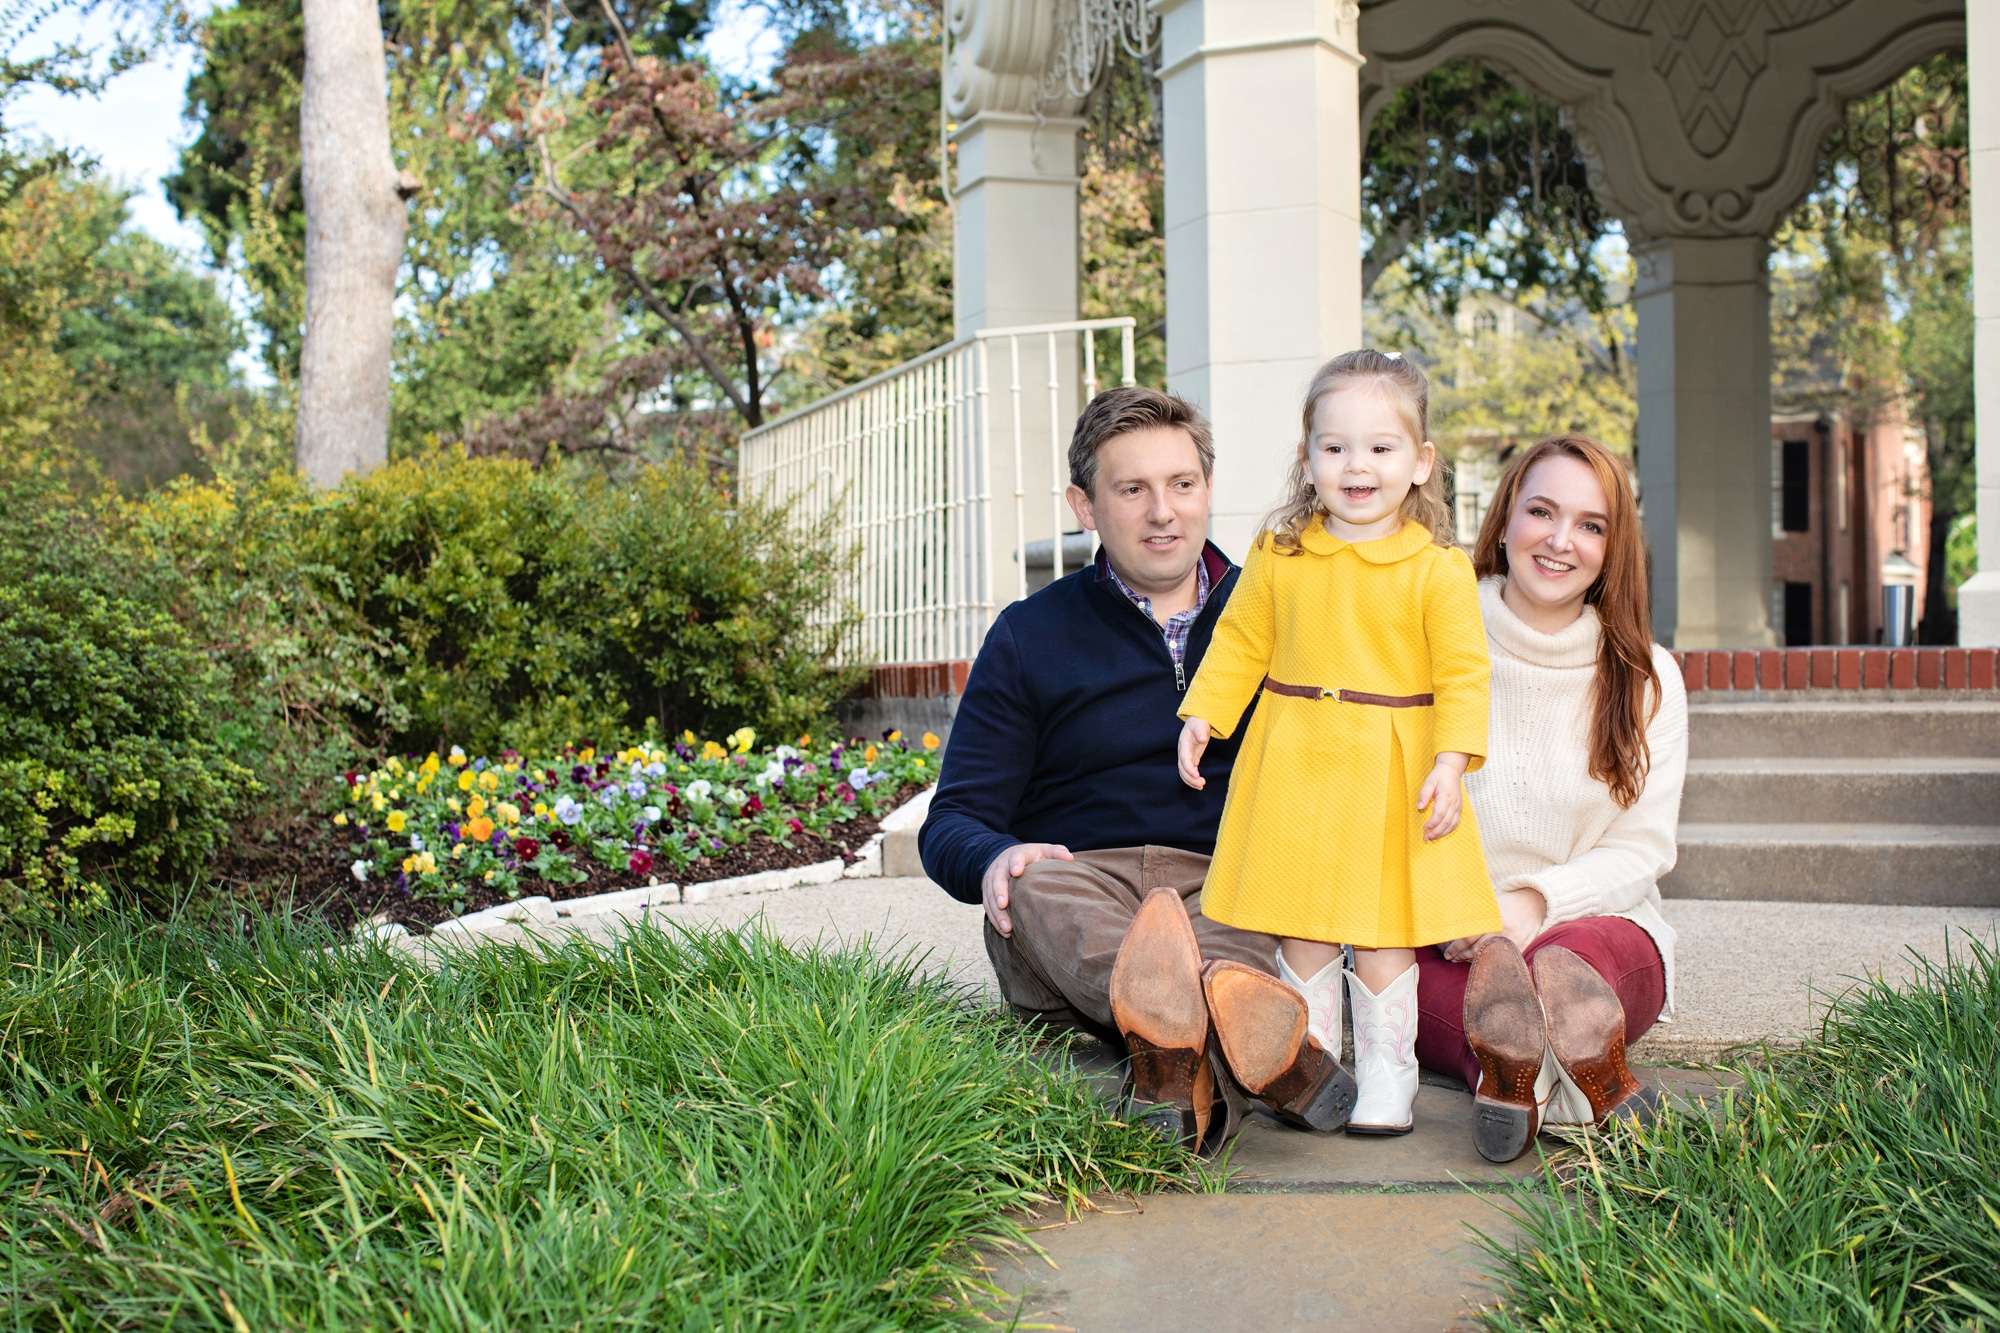 Adorable family posing outside in dallas